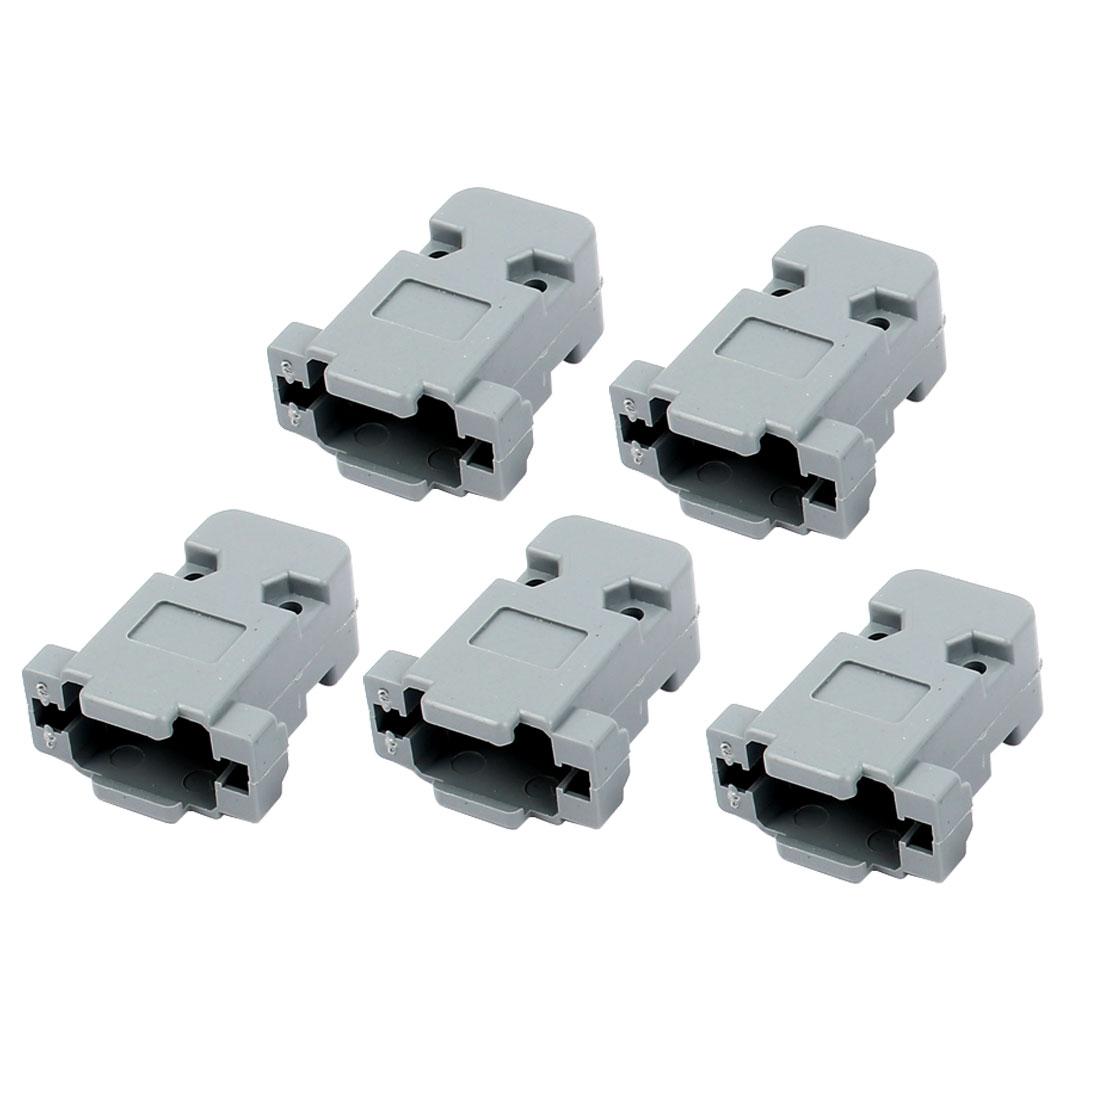 5 Pcs Serial Port D-Sub DB9 Connector Kit Gray Plastic Hoods Shell w Screws